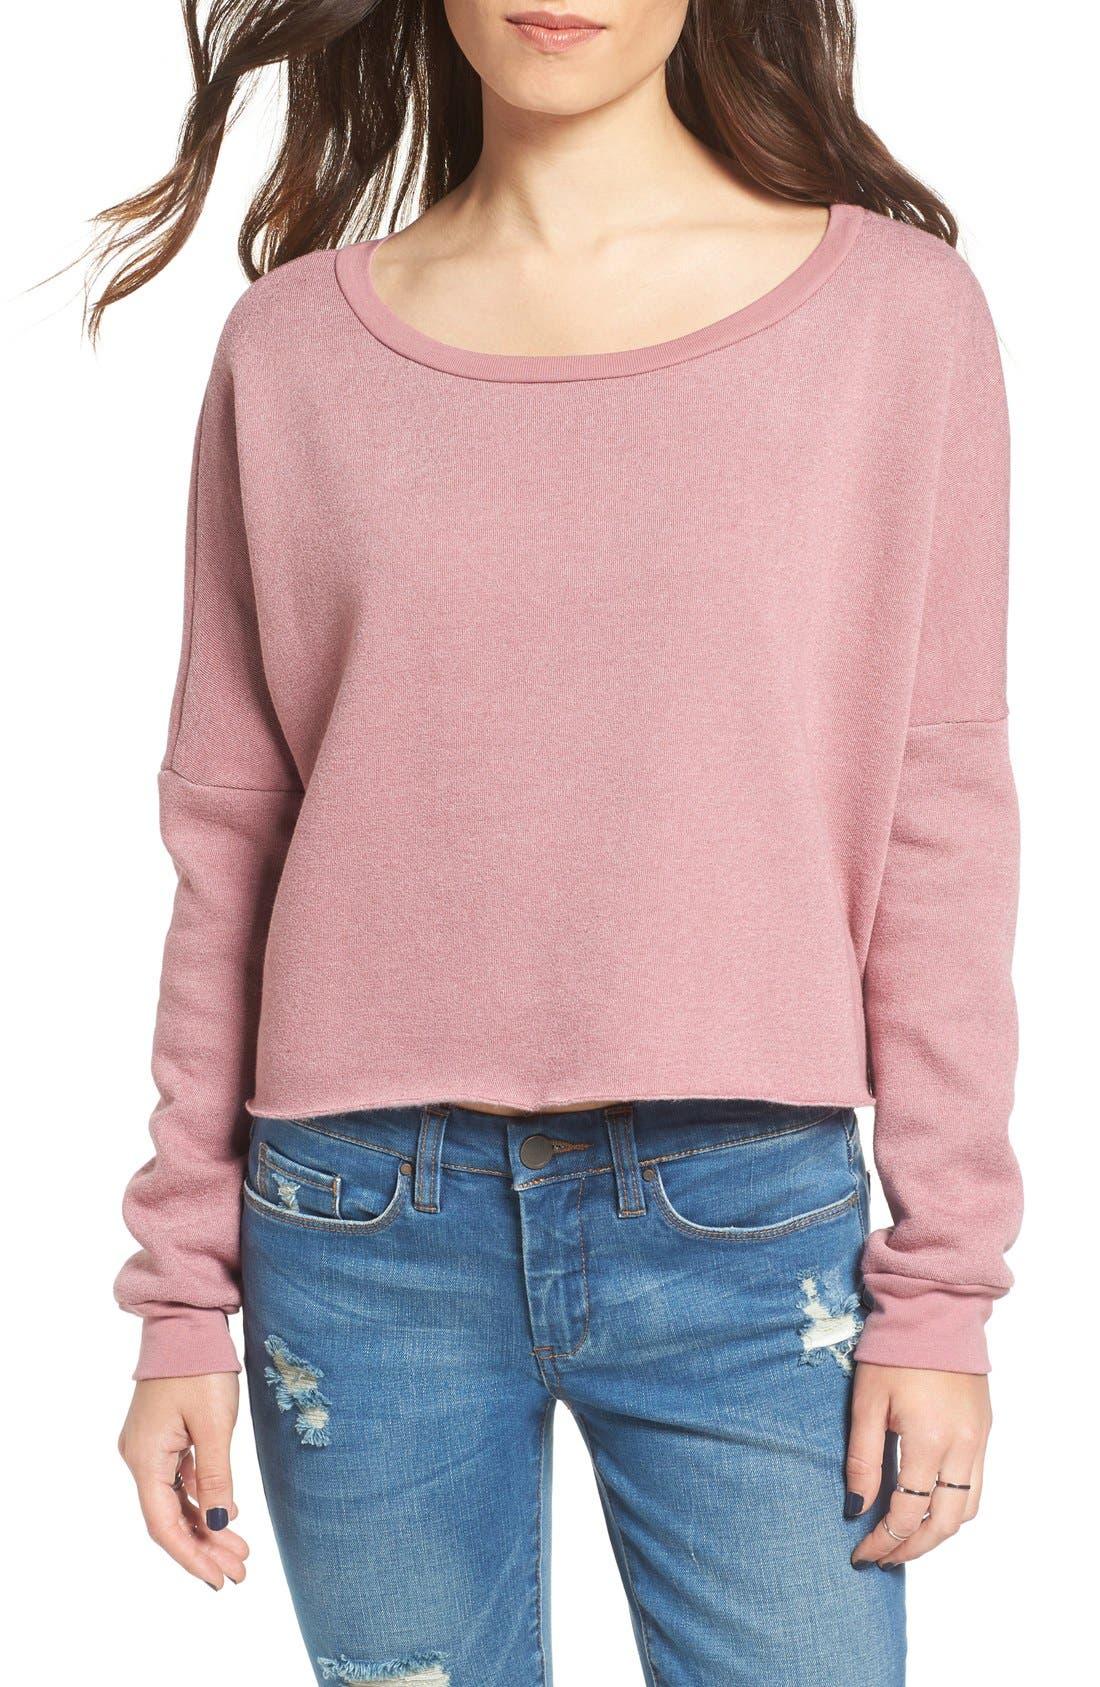 Main Image - Project Social T Raw Edge Crop Sweatshirt